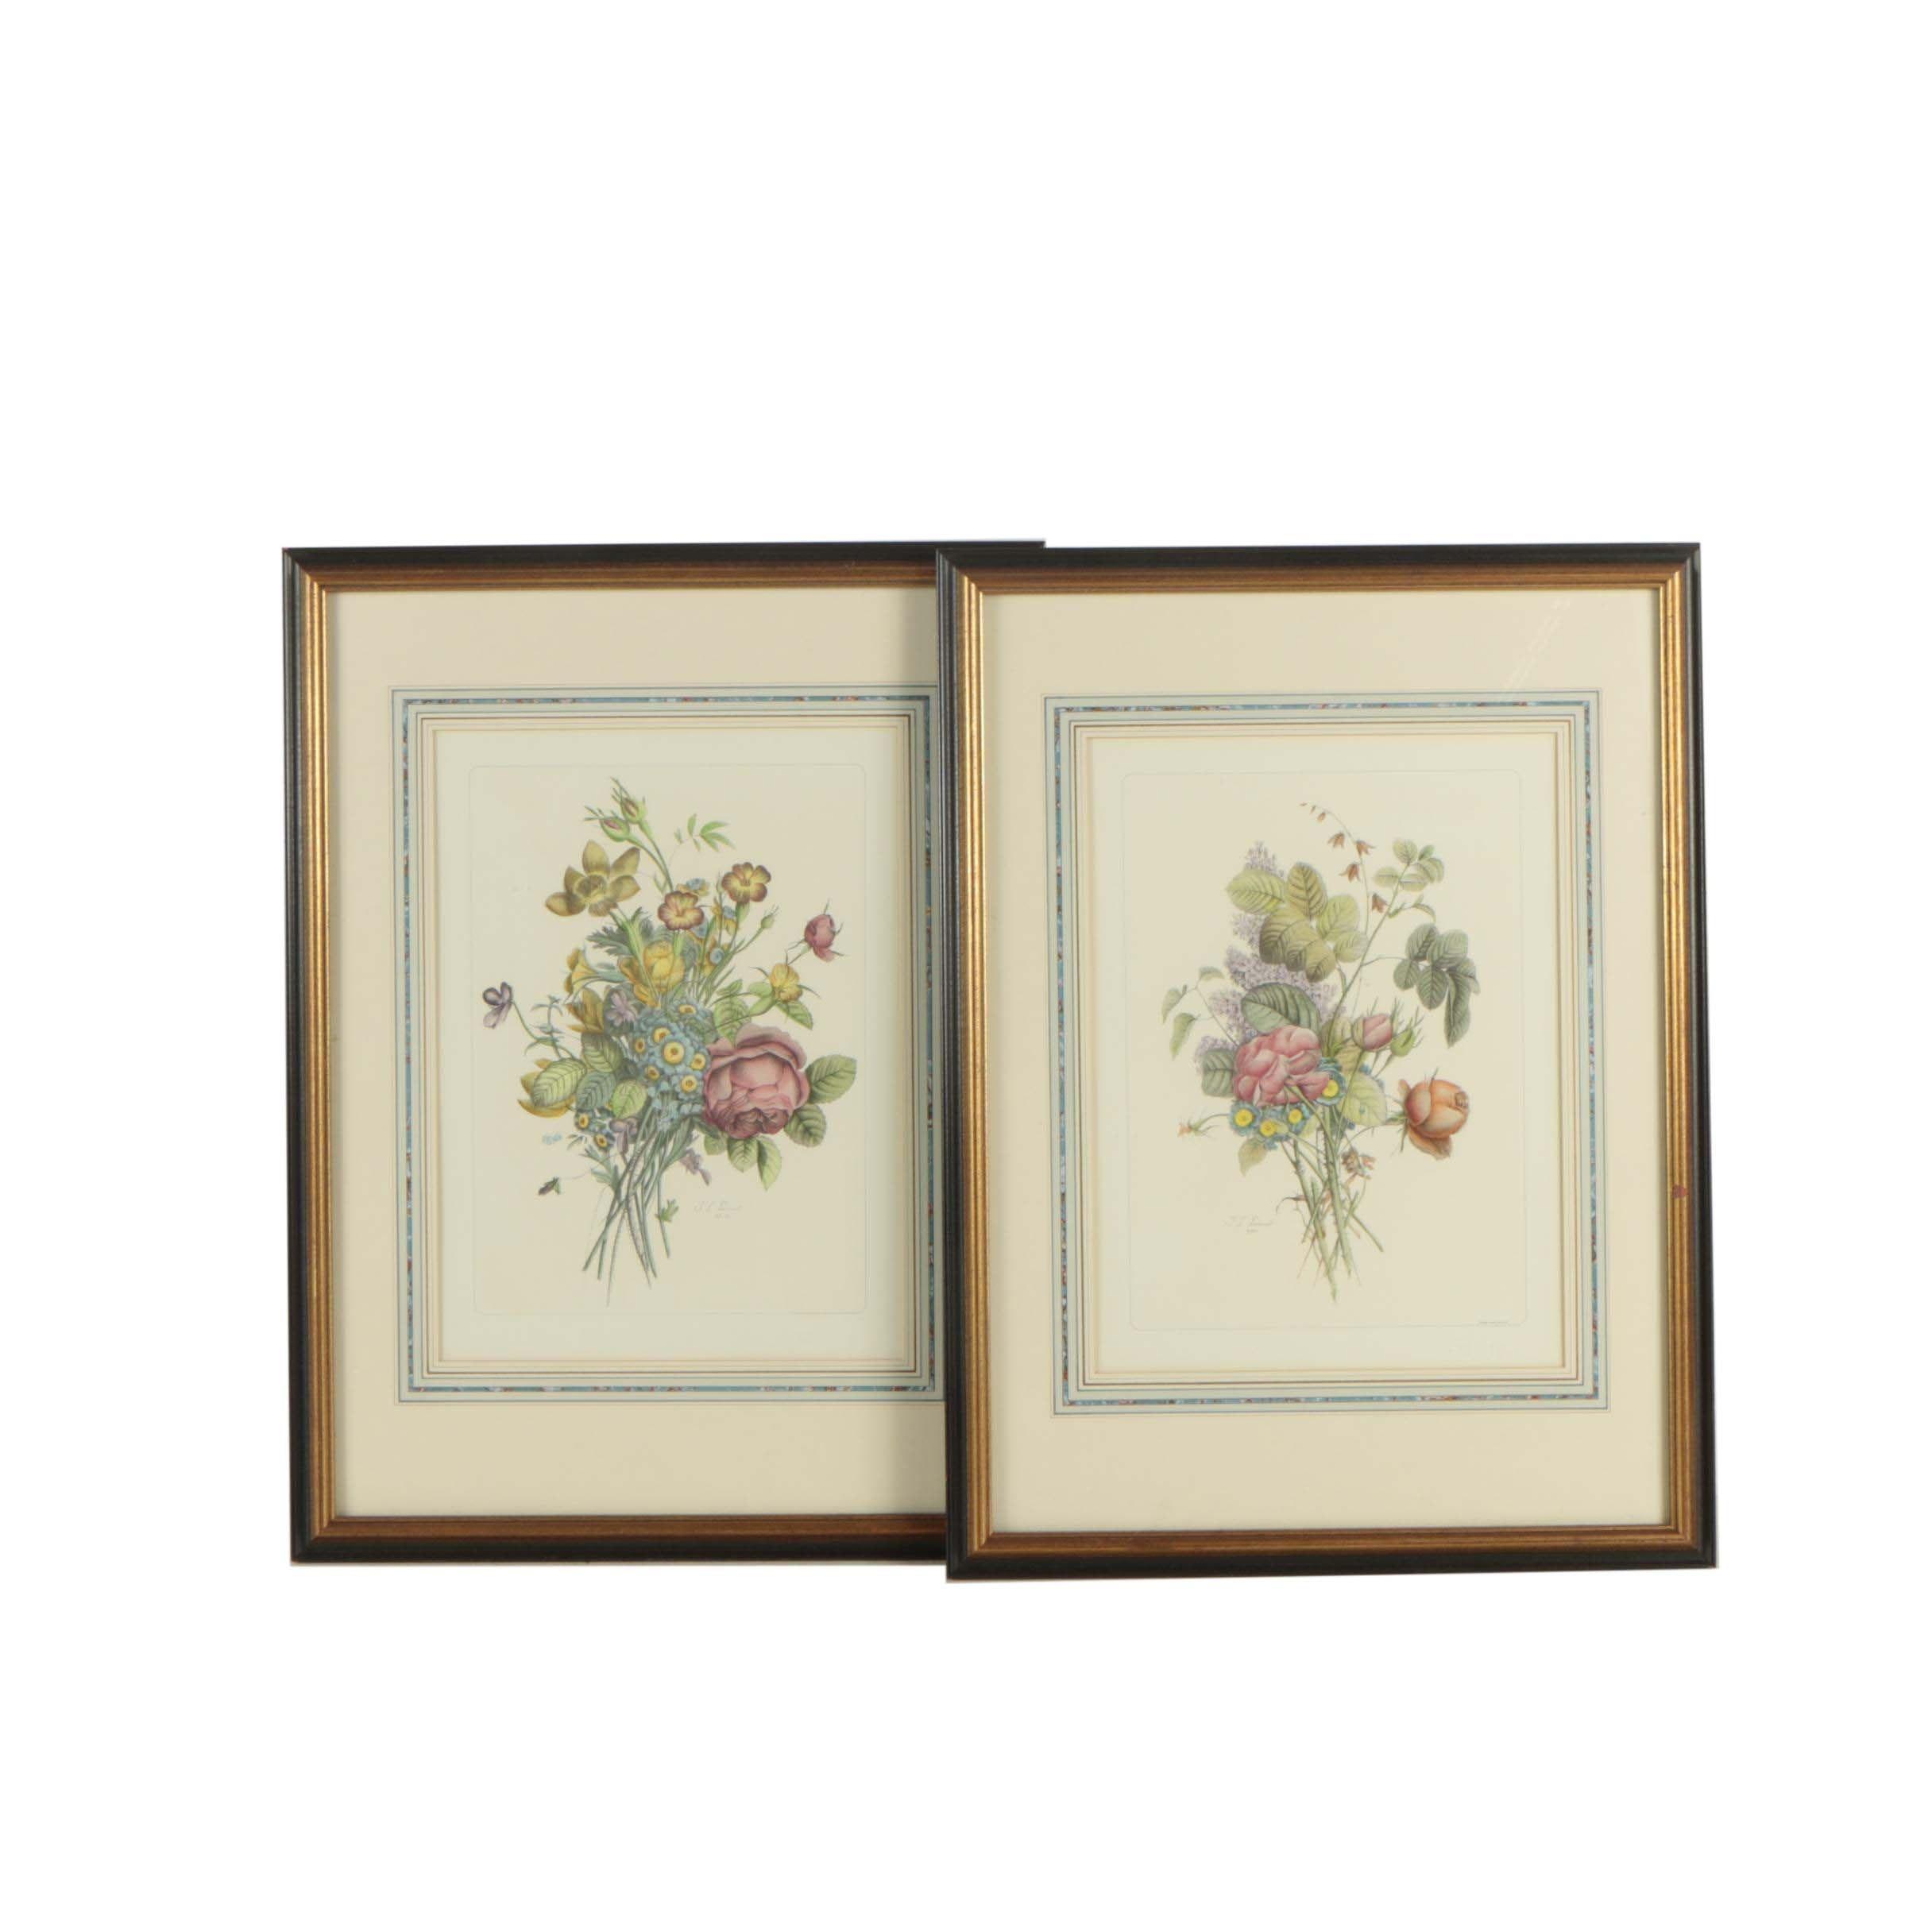 After J.L. Prevost Hand-Painted Halftone Prints